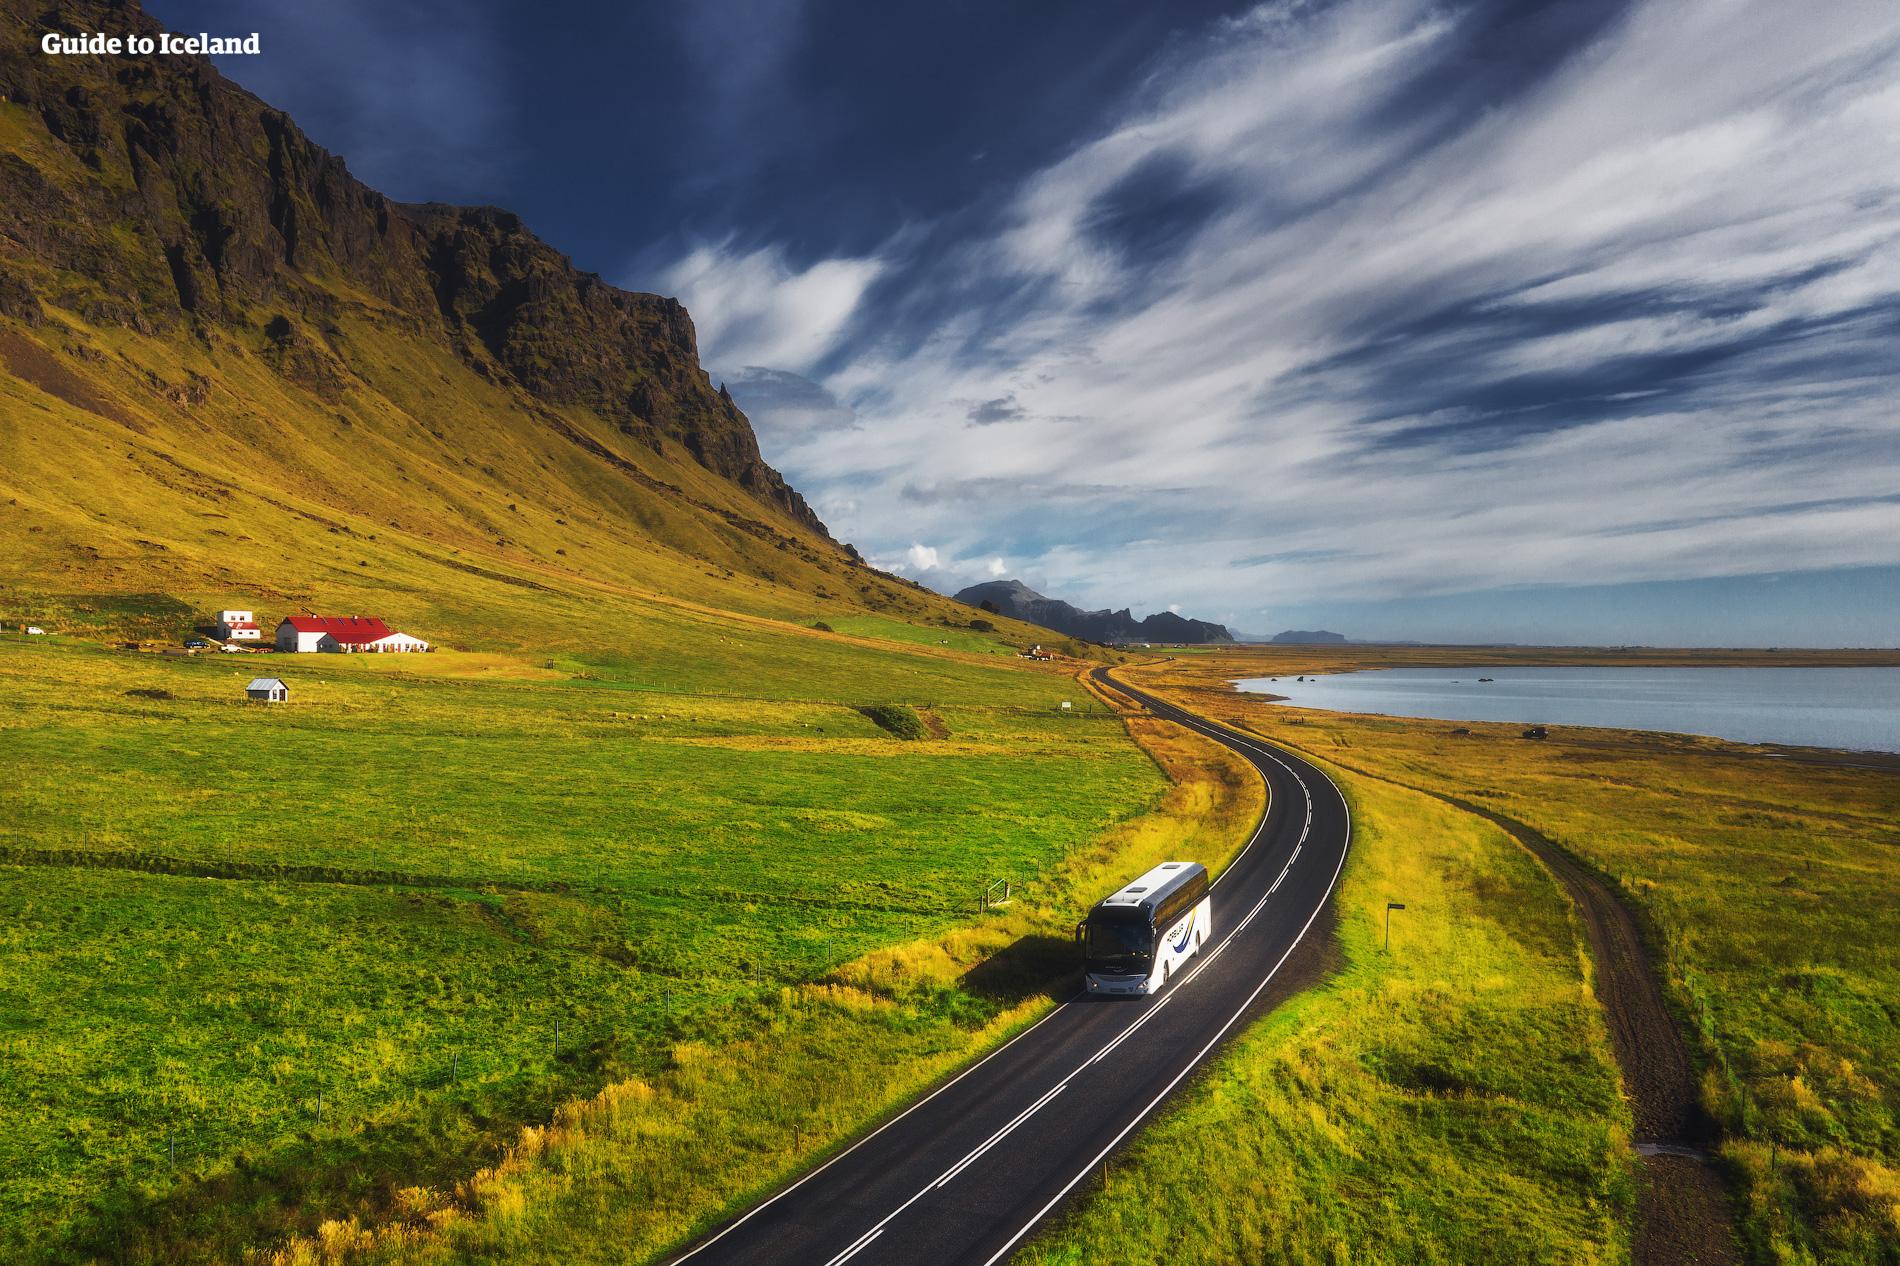 Scenic 5 Day Road Trip Adventure Through Iceland's South Coast, Landmannalaugar & Highlands - day 5